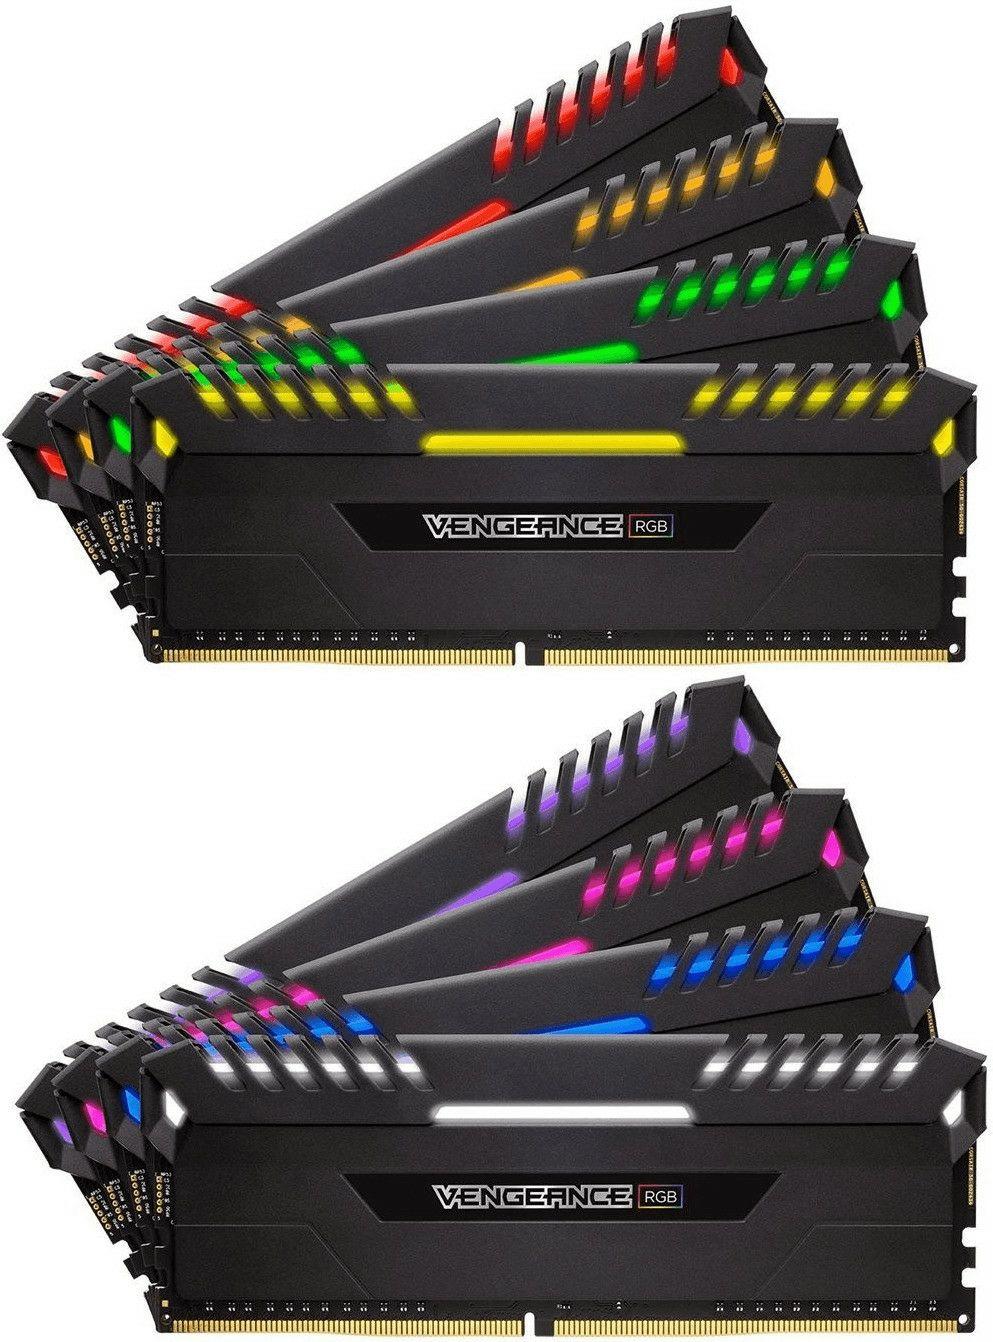 Corsair Vengeance RGB 64GB (8 x 8GB) DDR4 3800MHz C19 XMP 2.0 Enthusiast RGB LED-Beleuchtung Speicherkit, schwarz